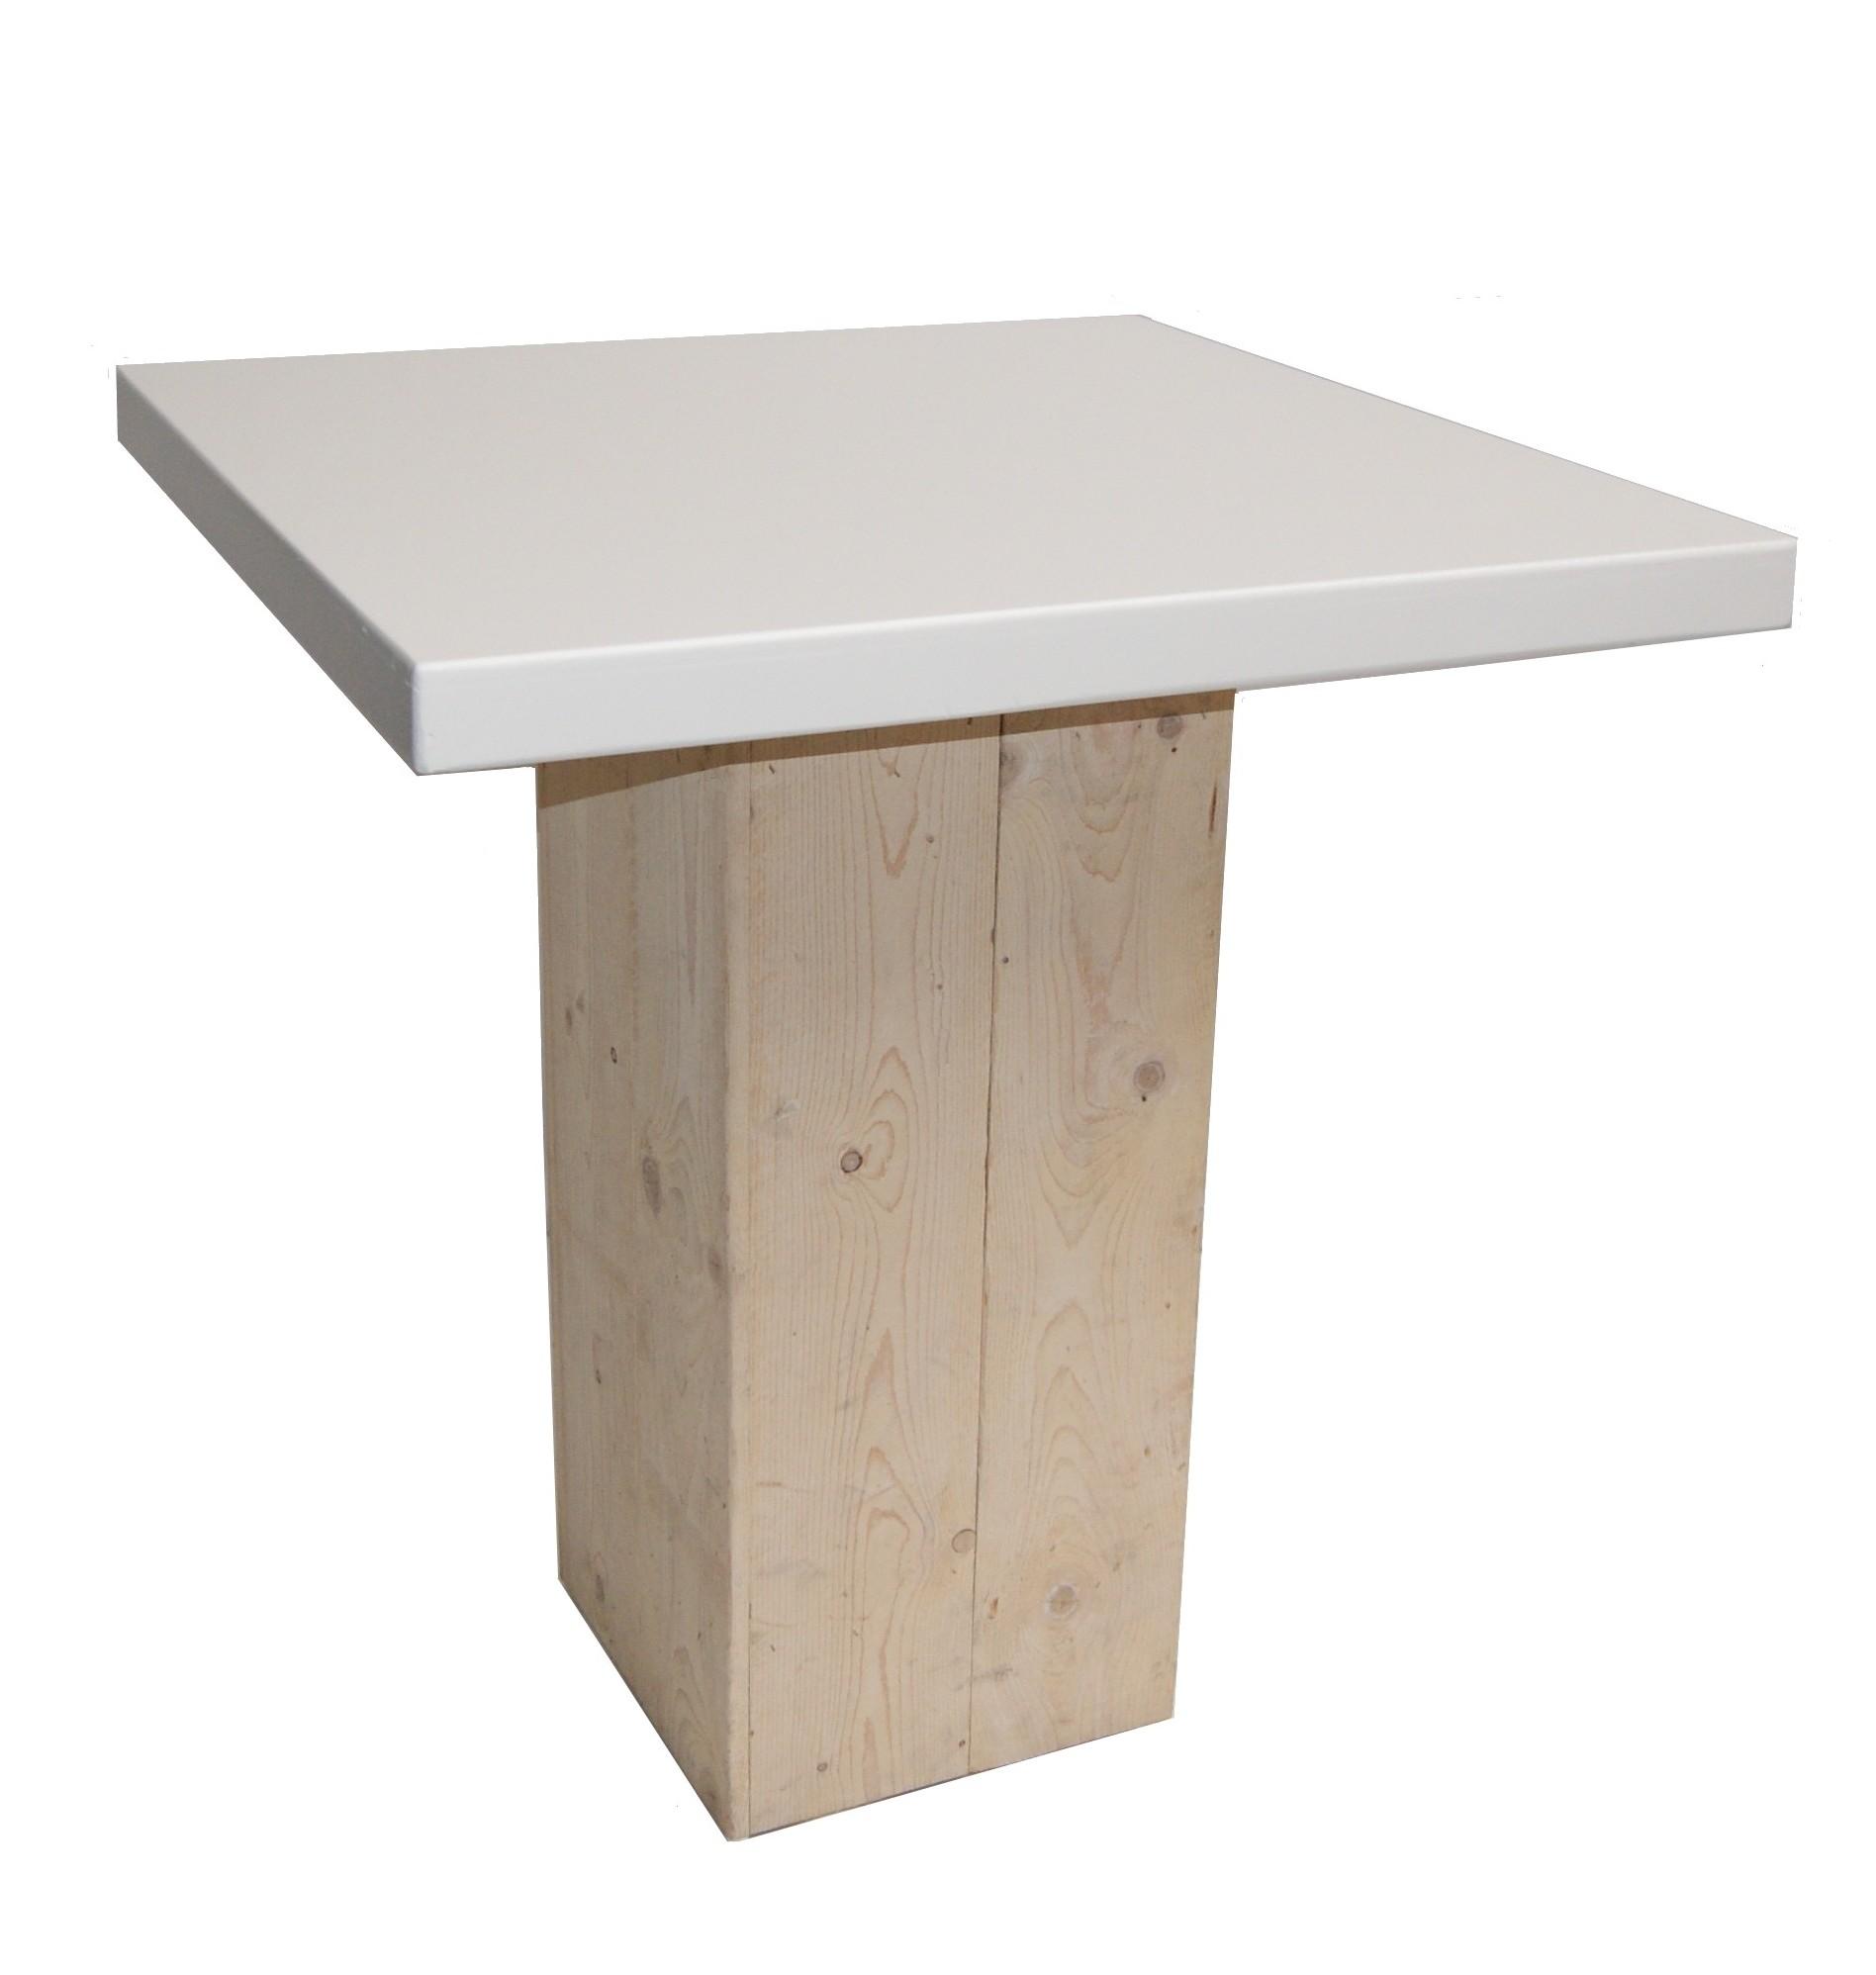 Stoelen en tafels verhuur zuid limburg deguelle party for Designhotel maastricht comfort xl